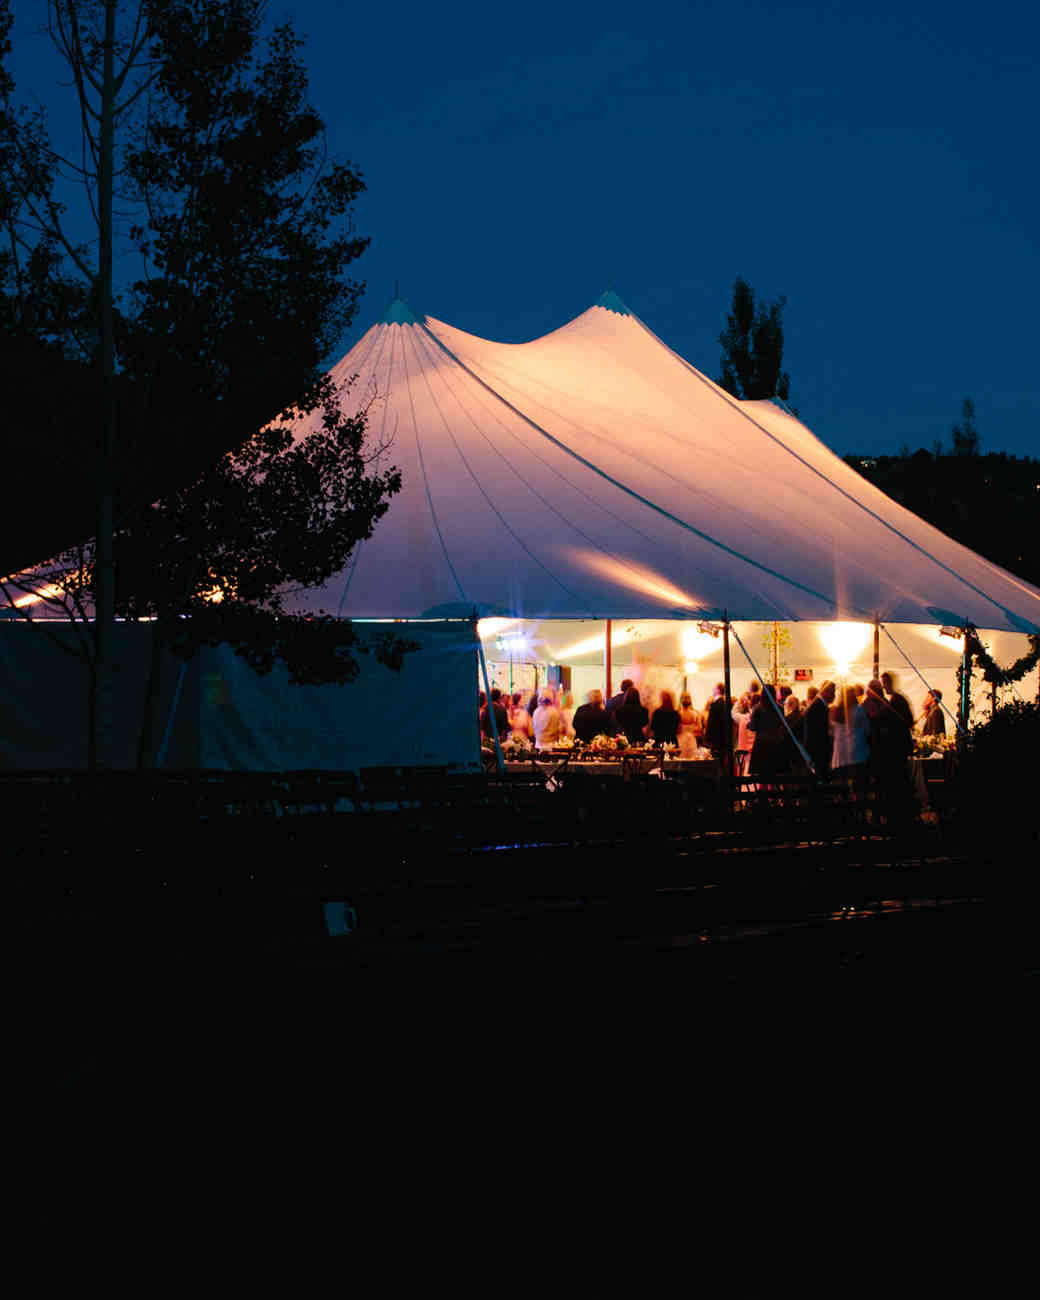 jamie-alex-wedding-tent-294-s111544-1014.jpg